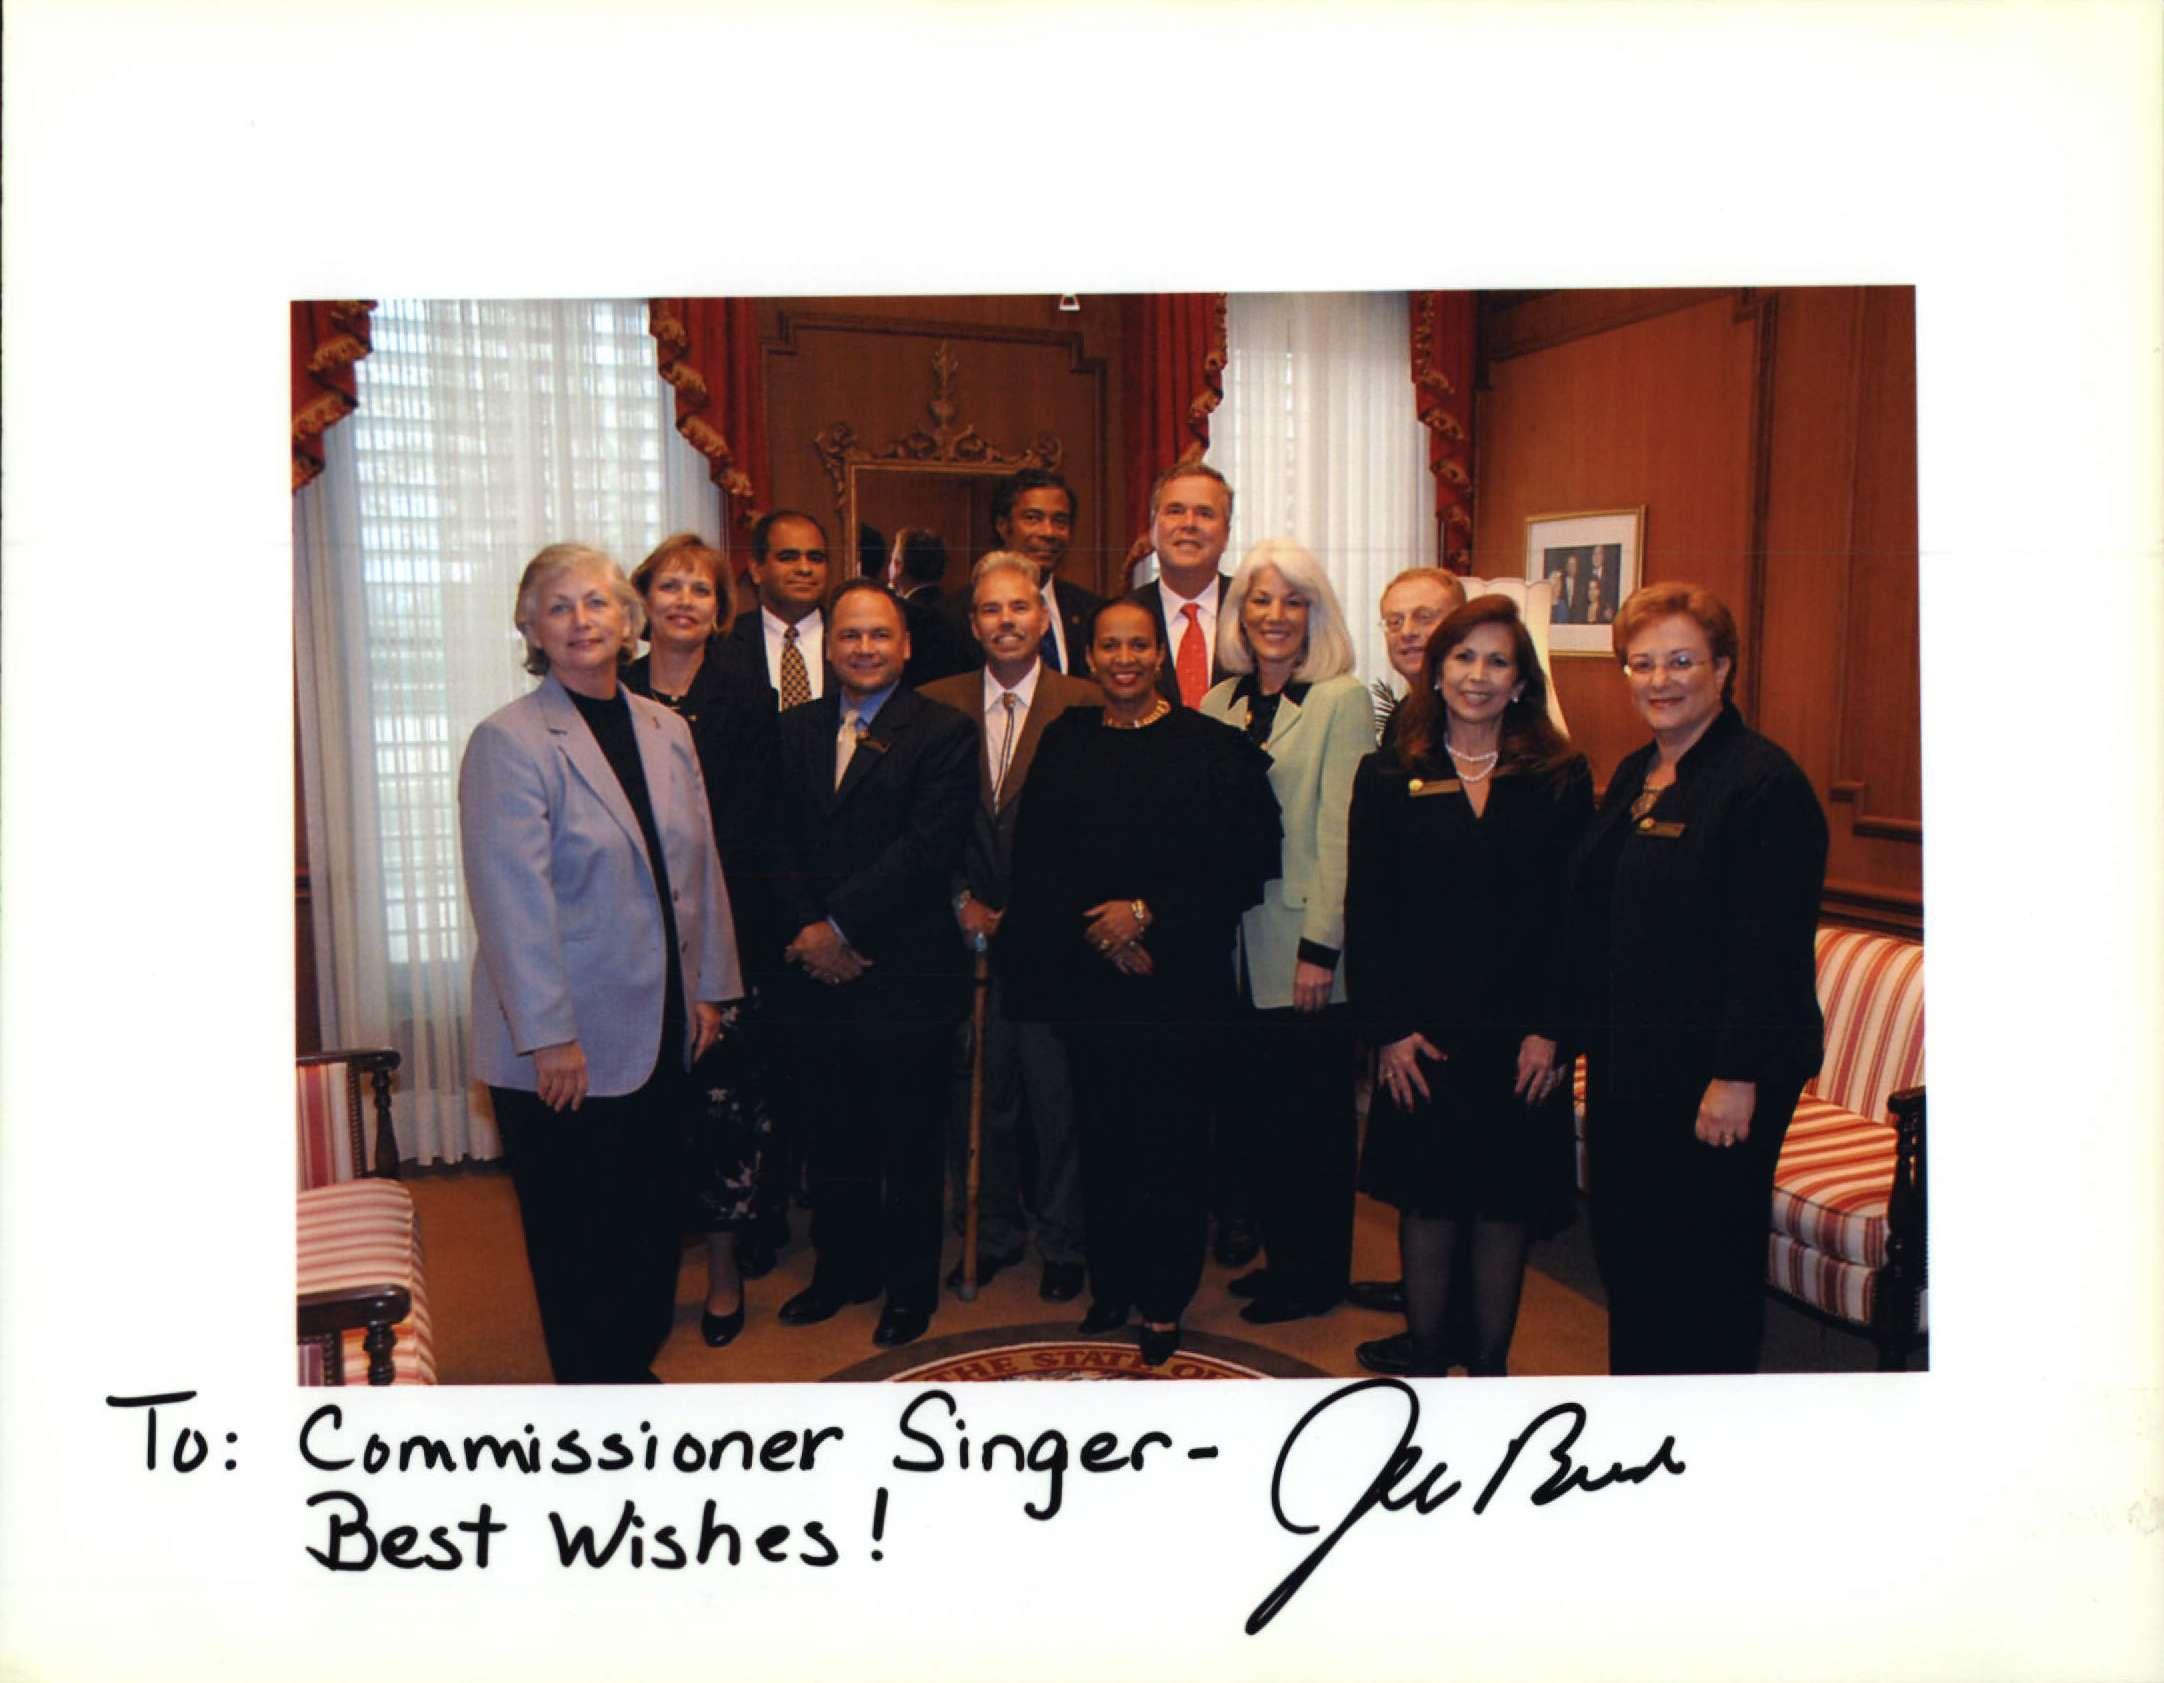 Jeb Bush to Commissioner Singer